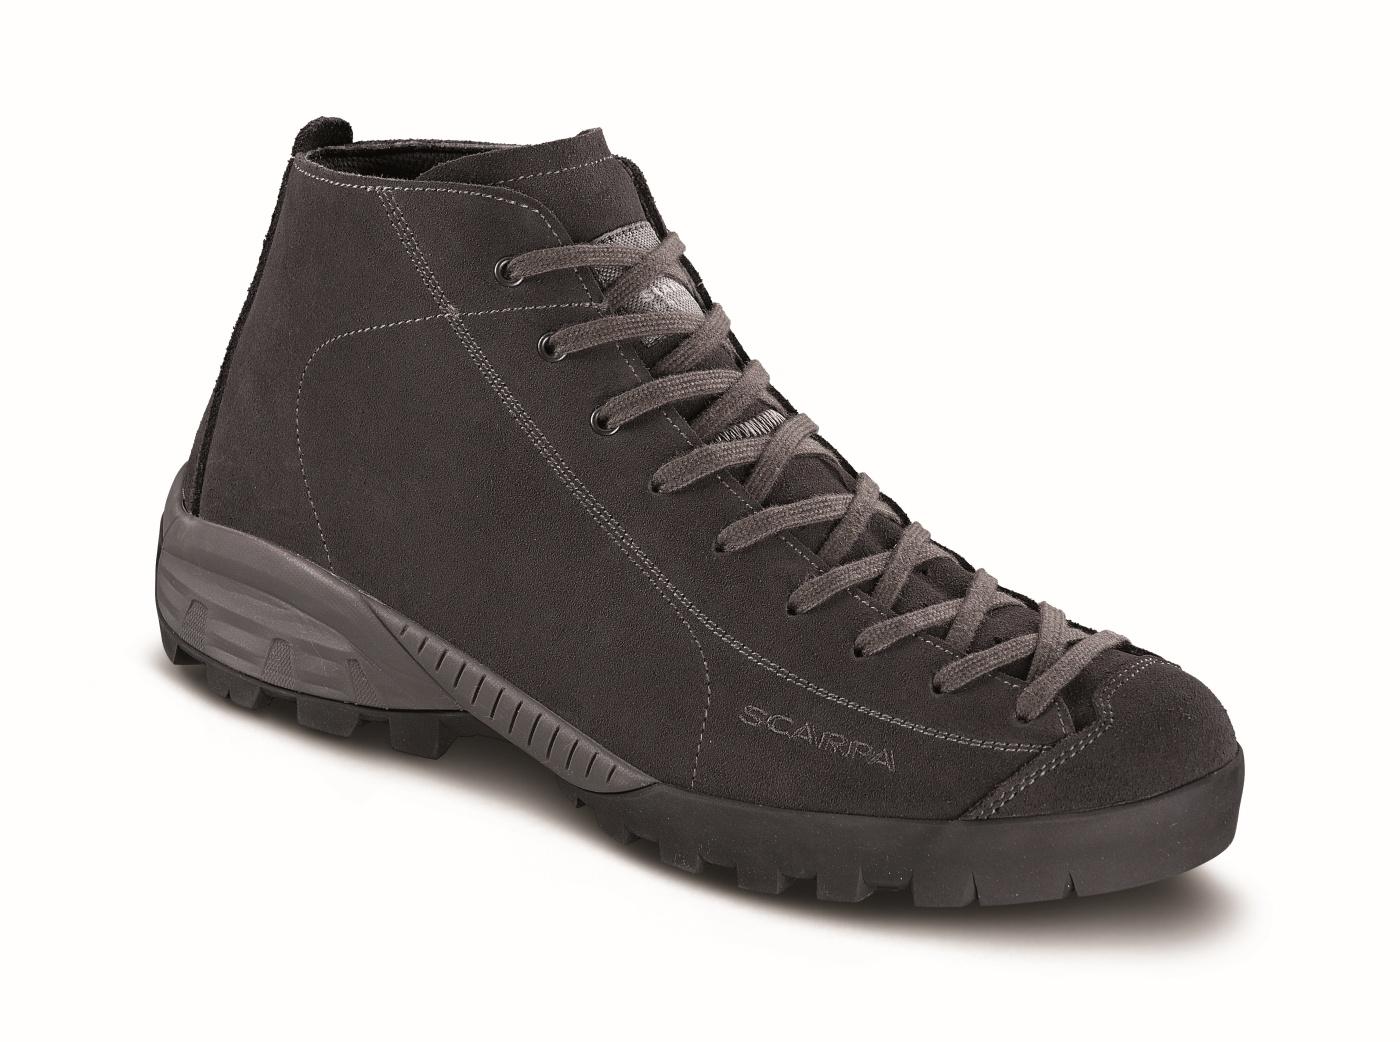 Scarpa MOJITO BASIC GTX Trekking boots Trekking støvler